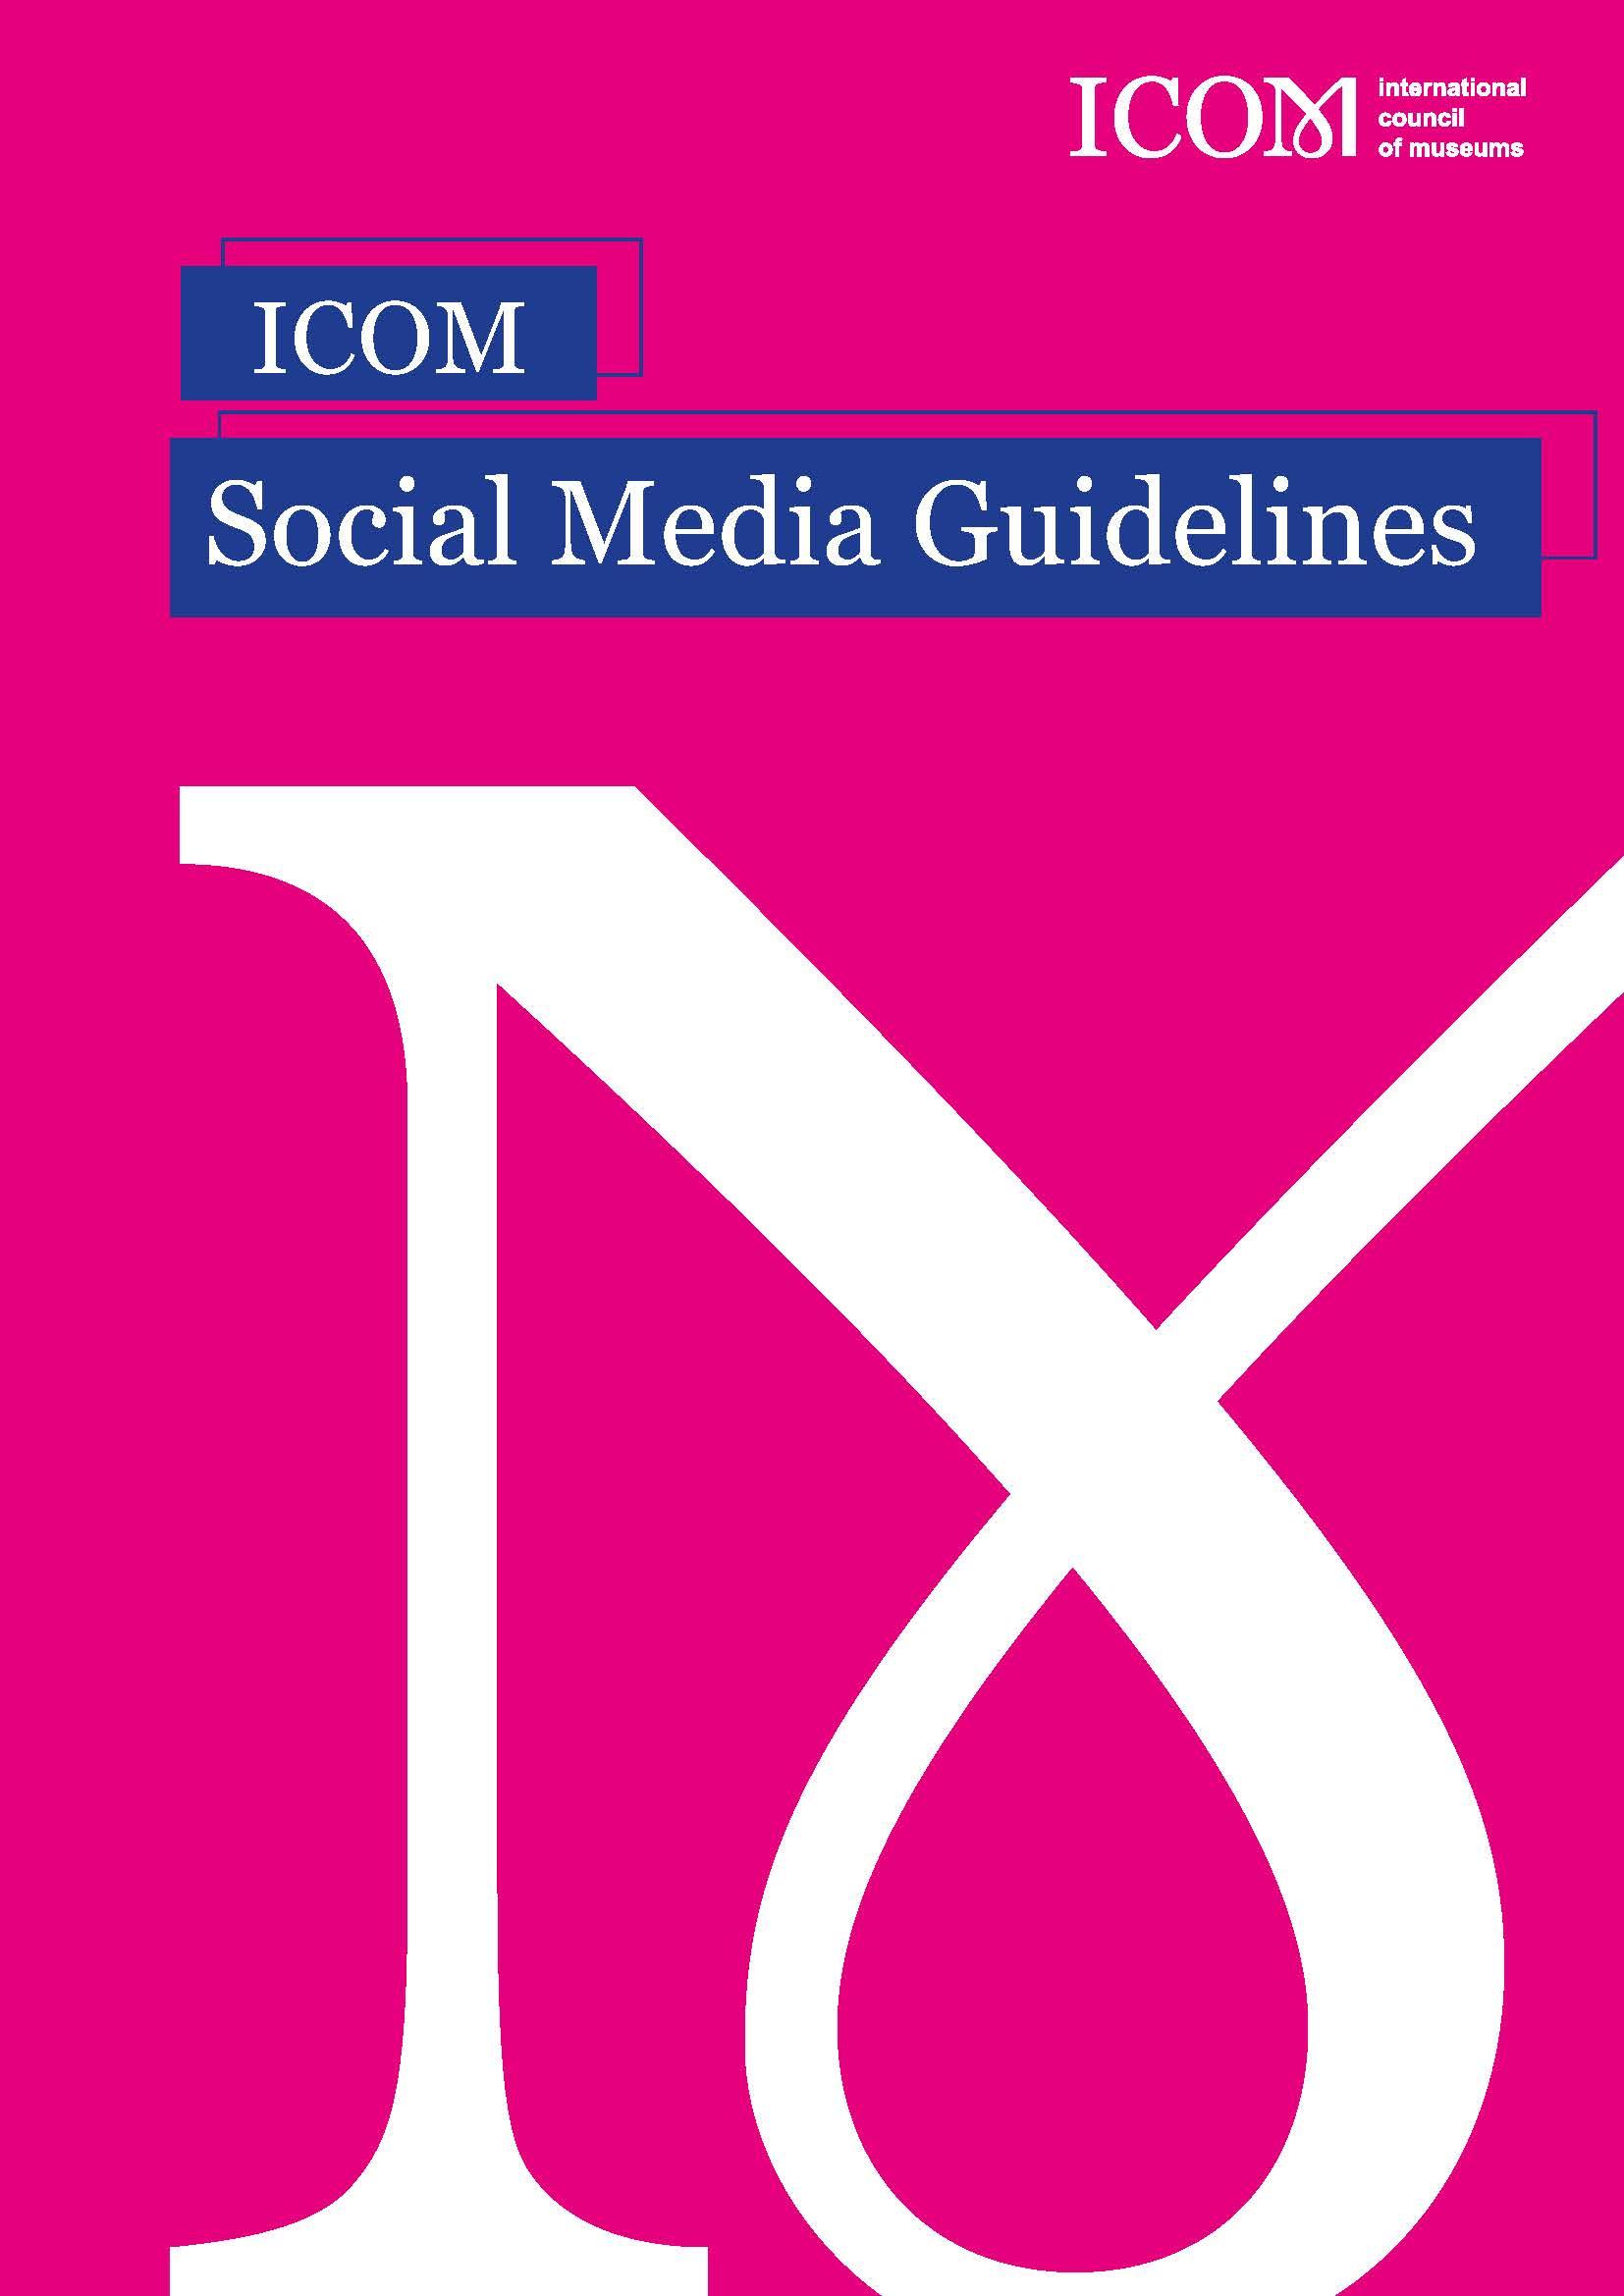 ICOM Social Media Guidelines